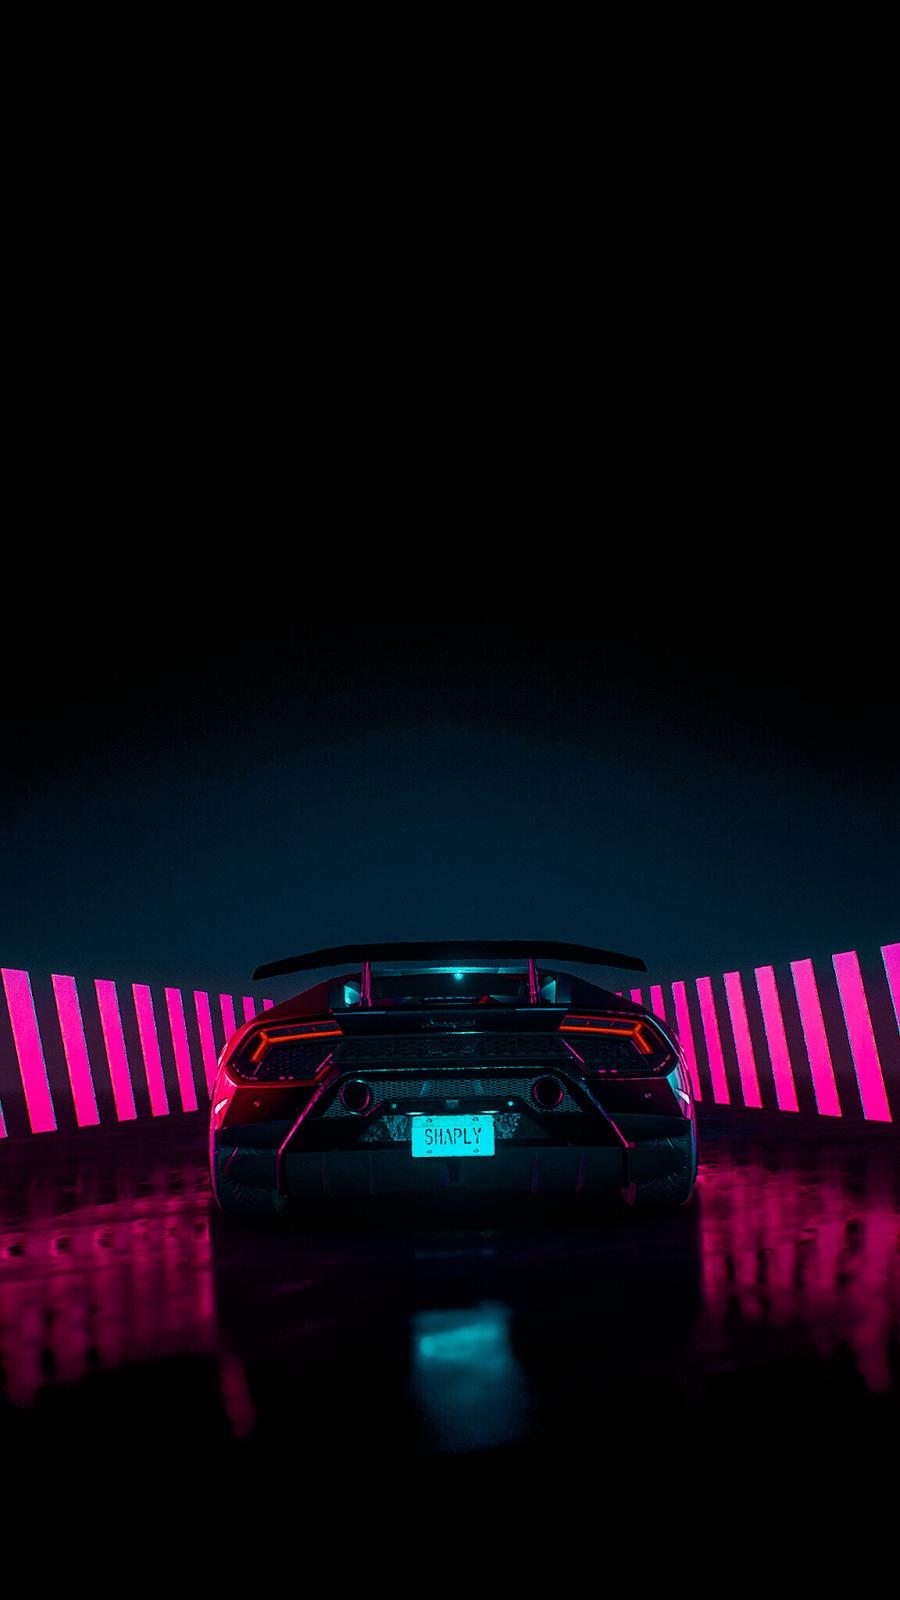 6 Amazing Cars Phone Wallpapers Cool Wallpapers Heroscreen Cc In 2020 Amazing Cars Cool Wallpapers For Phones Phone Wallpaper